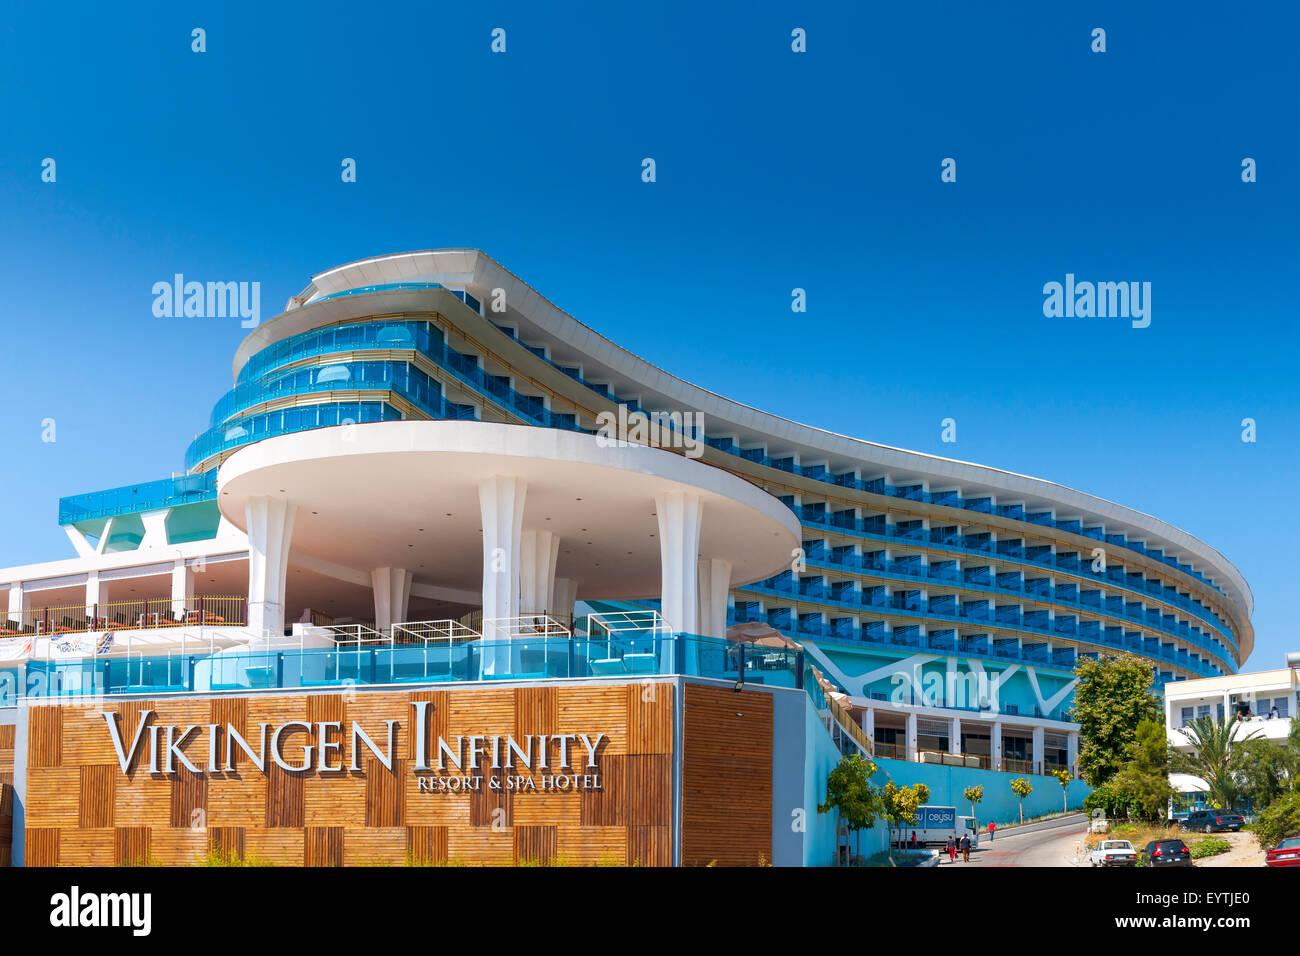 Turkey, hotel complex, Vikingen Infinity Resort & spa hotel, Alanya ...